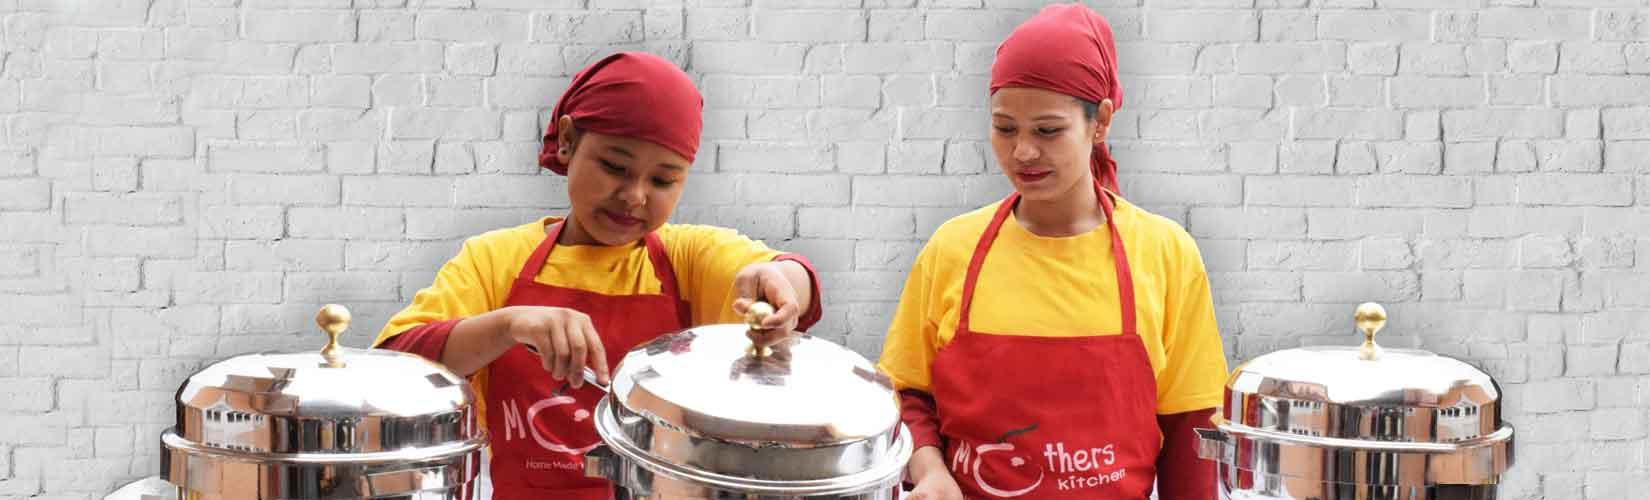 Catering Services in kathmandu | Best Caterers in Kathmandu